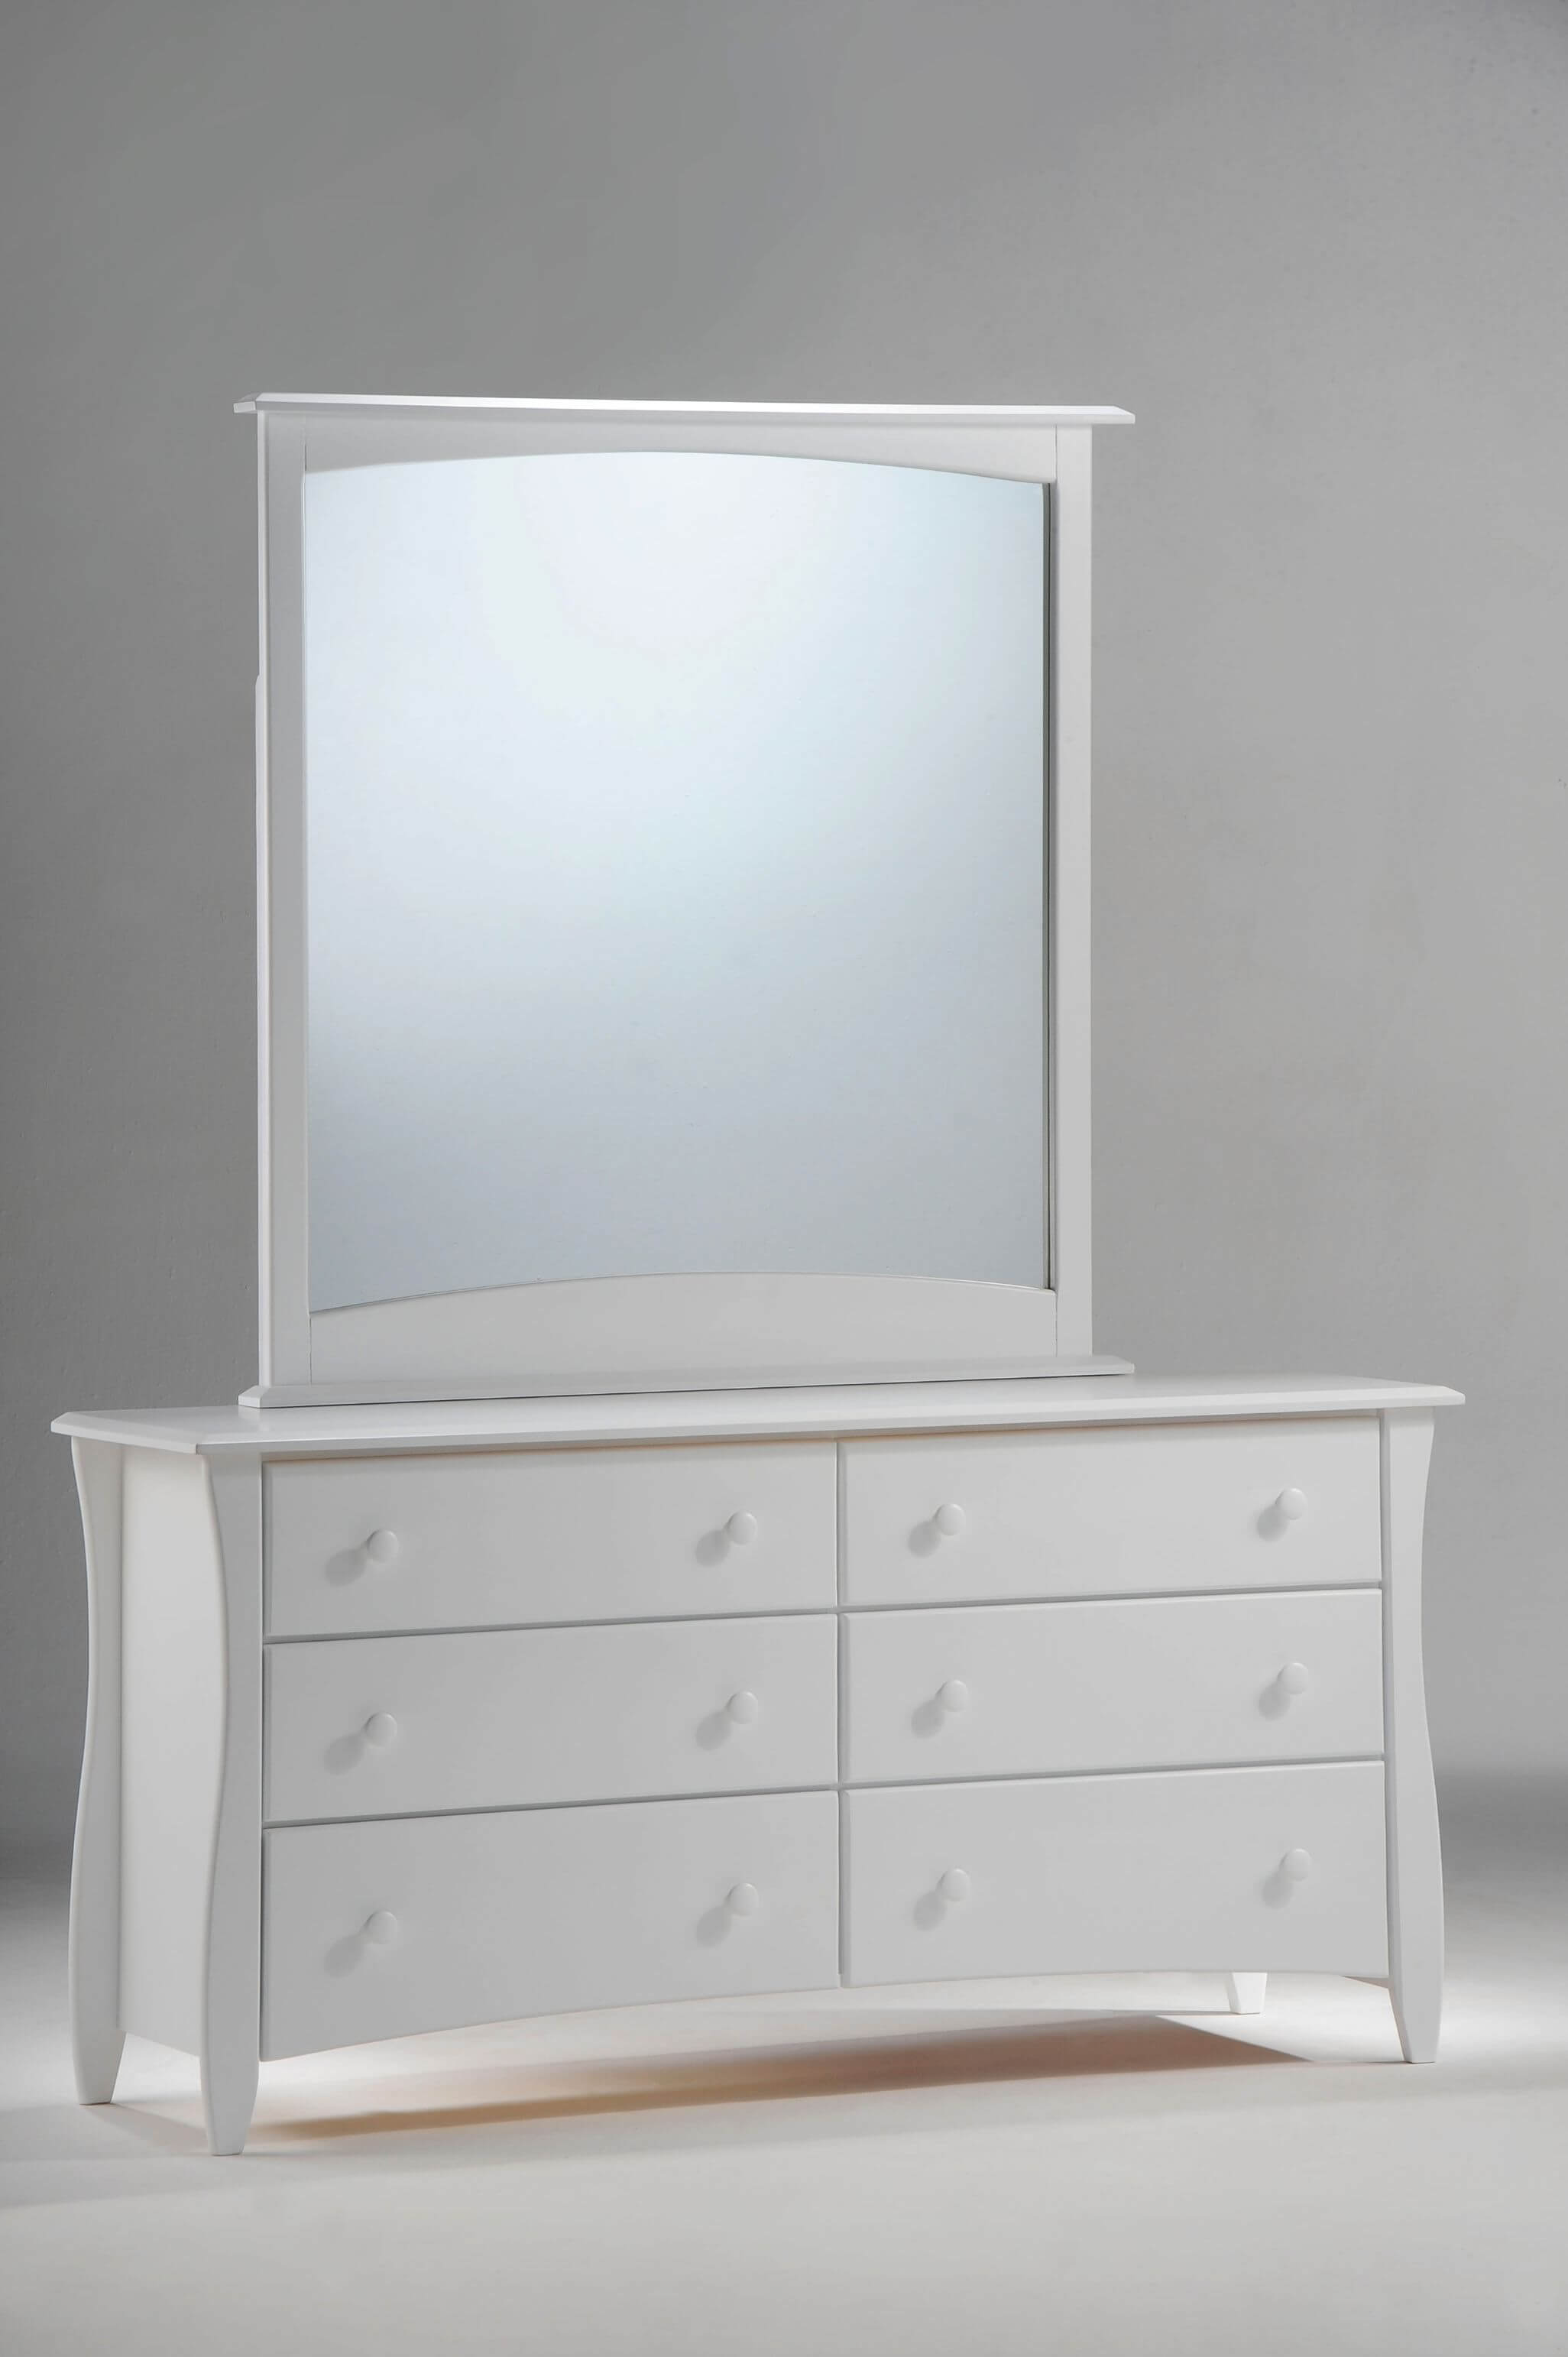 Clove 6 Drawer Dresser Amp Mirror Bedrooms Amp More Seattle